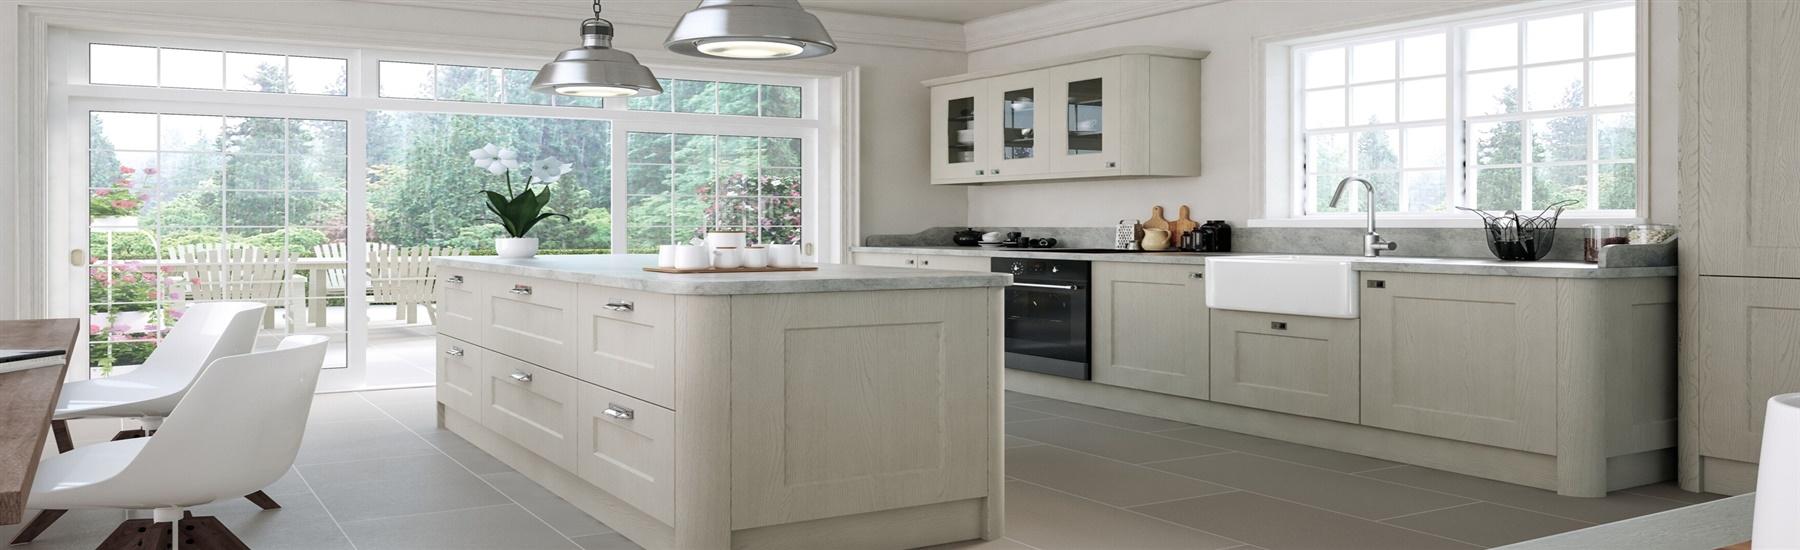 cambridge-kitchen